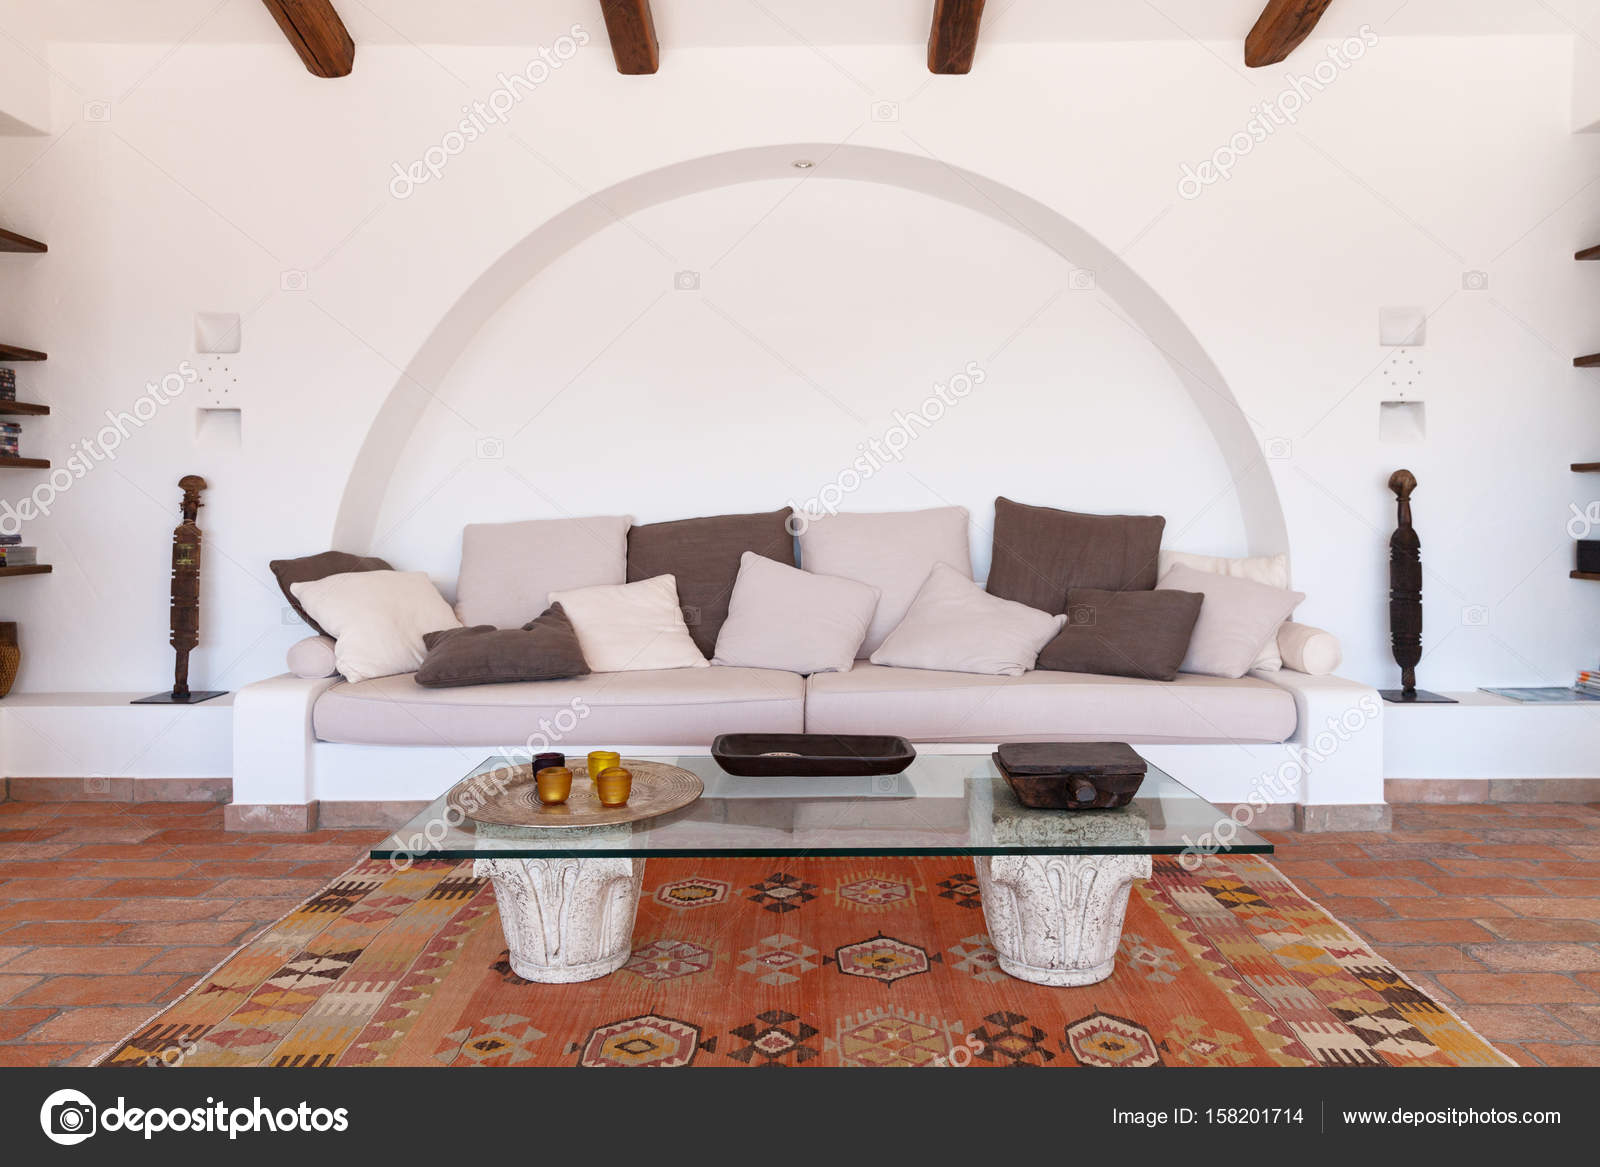 Furnish living room — Stock Photo © Zveiger #158201714